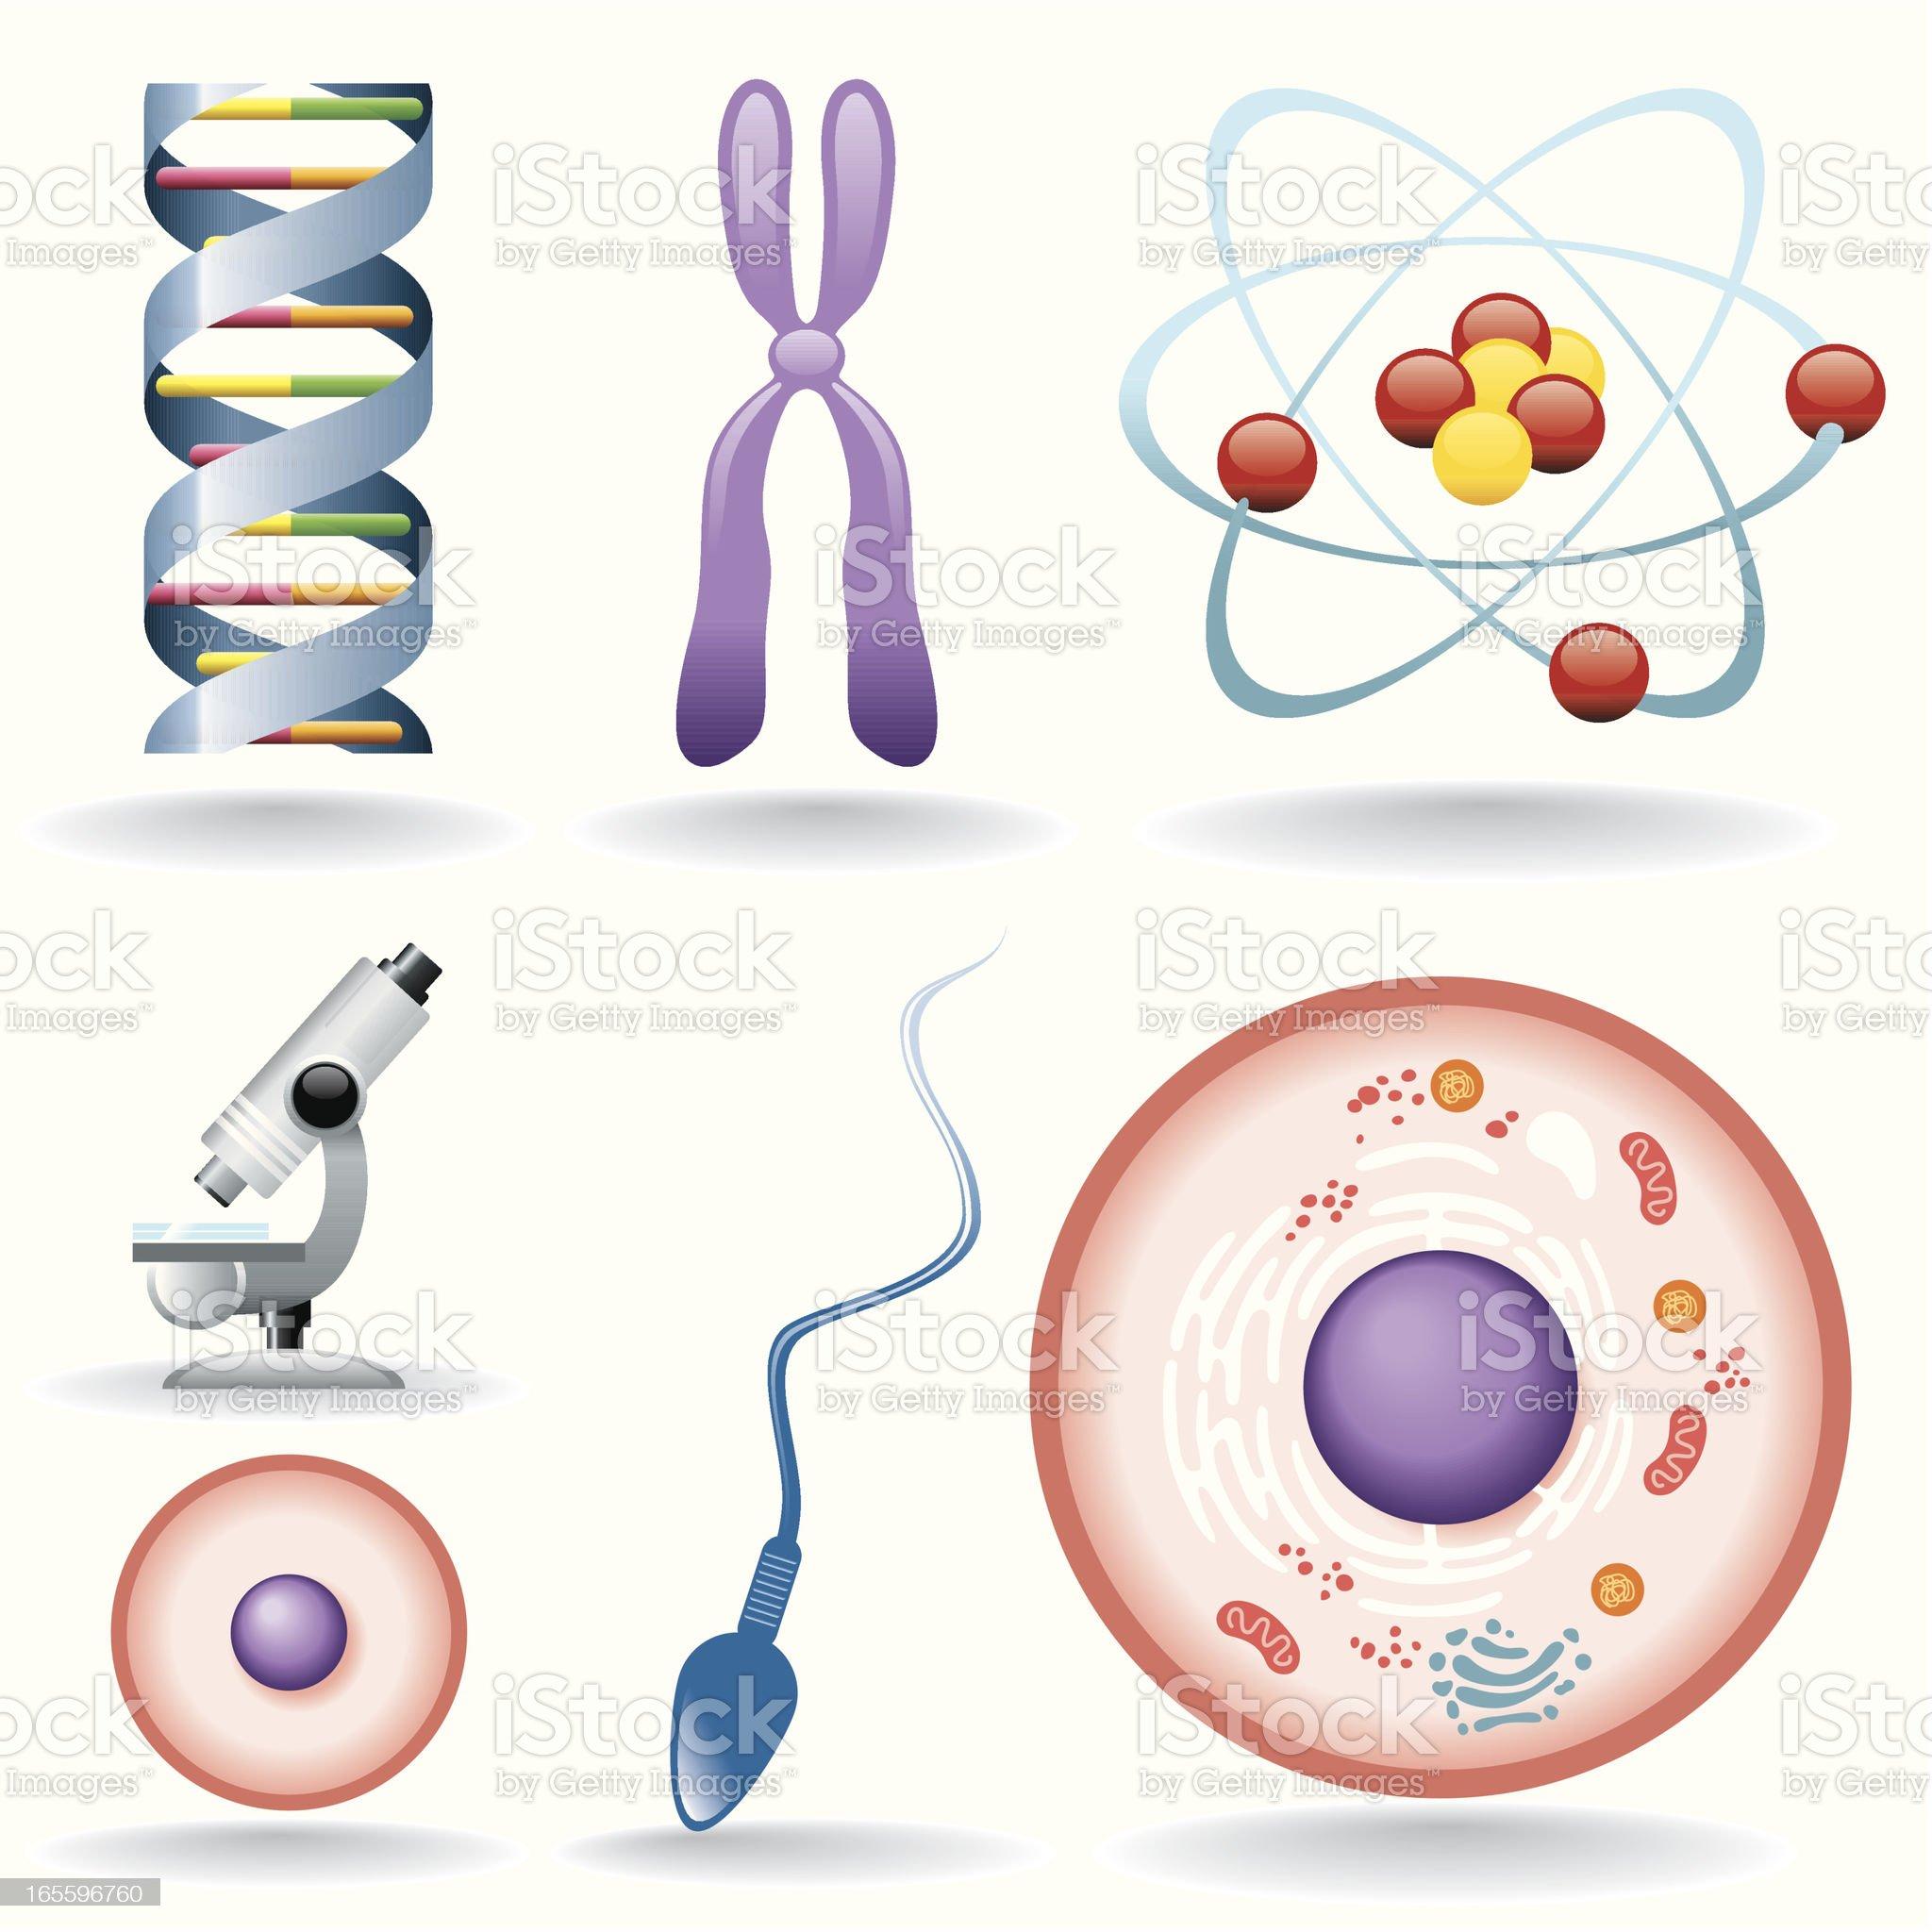 Icon Set, biology royalty-free stock vector art